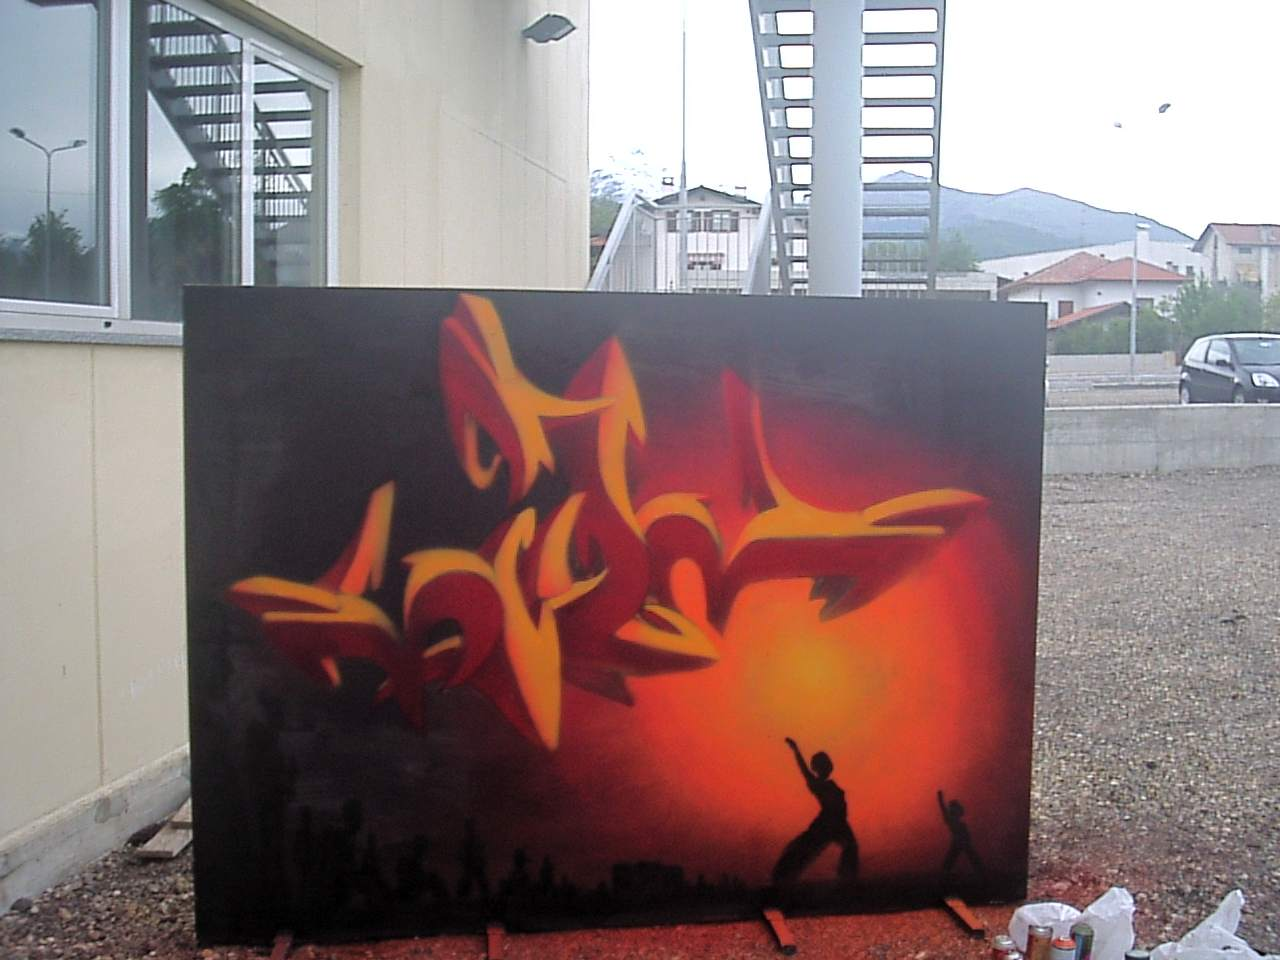 art crimes sir two p2